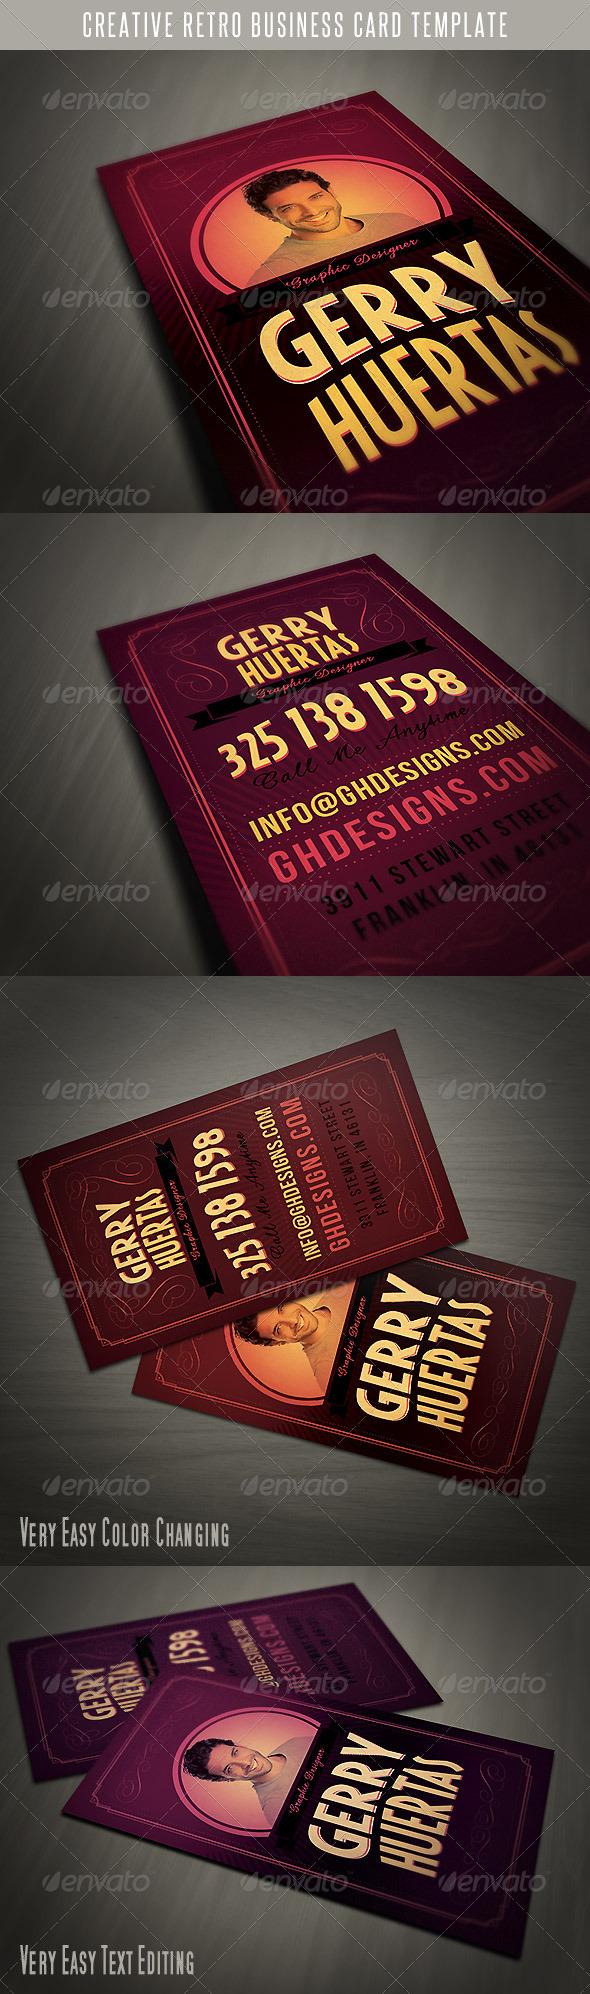 GraphicRiver Creative Retro Business Card 4702585